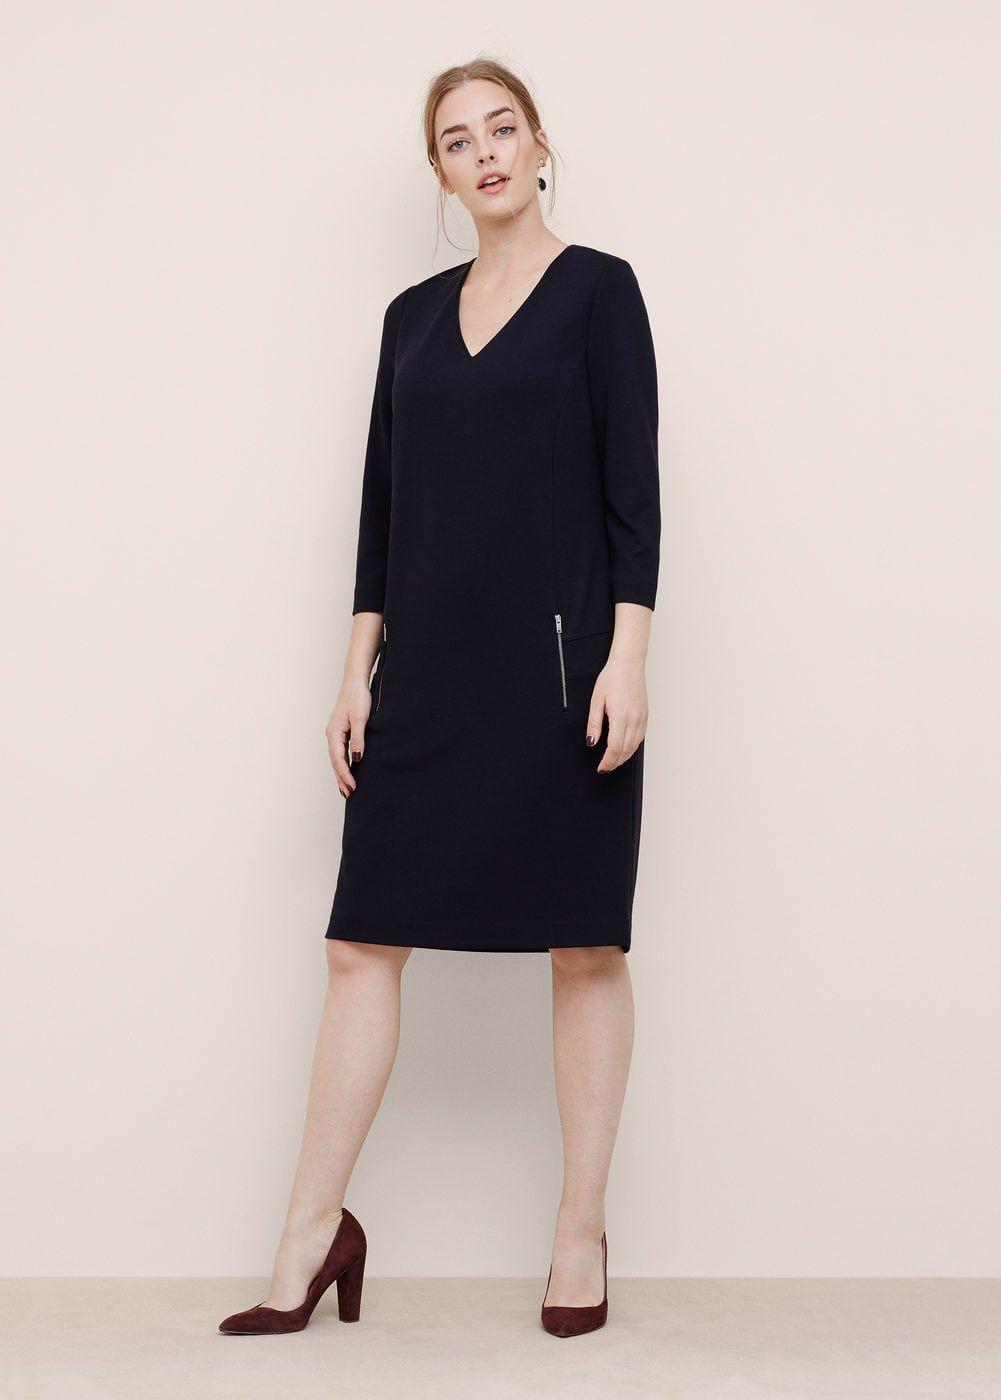 Zipped shift dress - Plus sizes   big girl job wear   Pinterest ... 93ef1d40c1